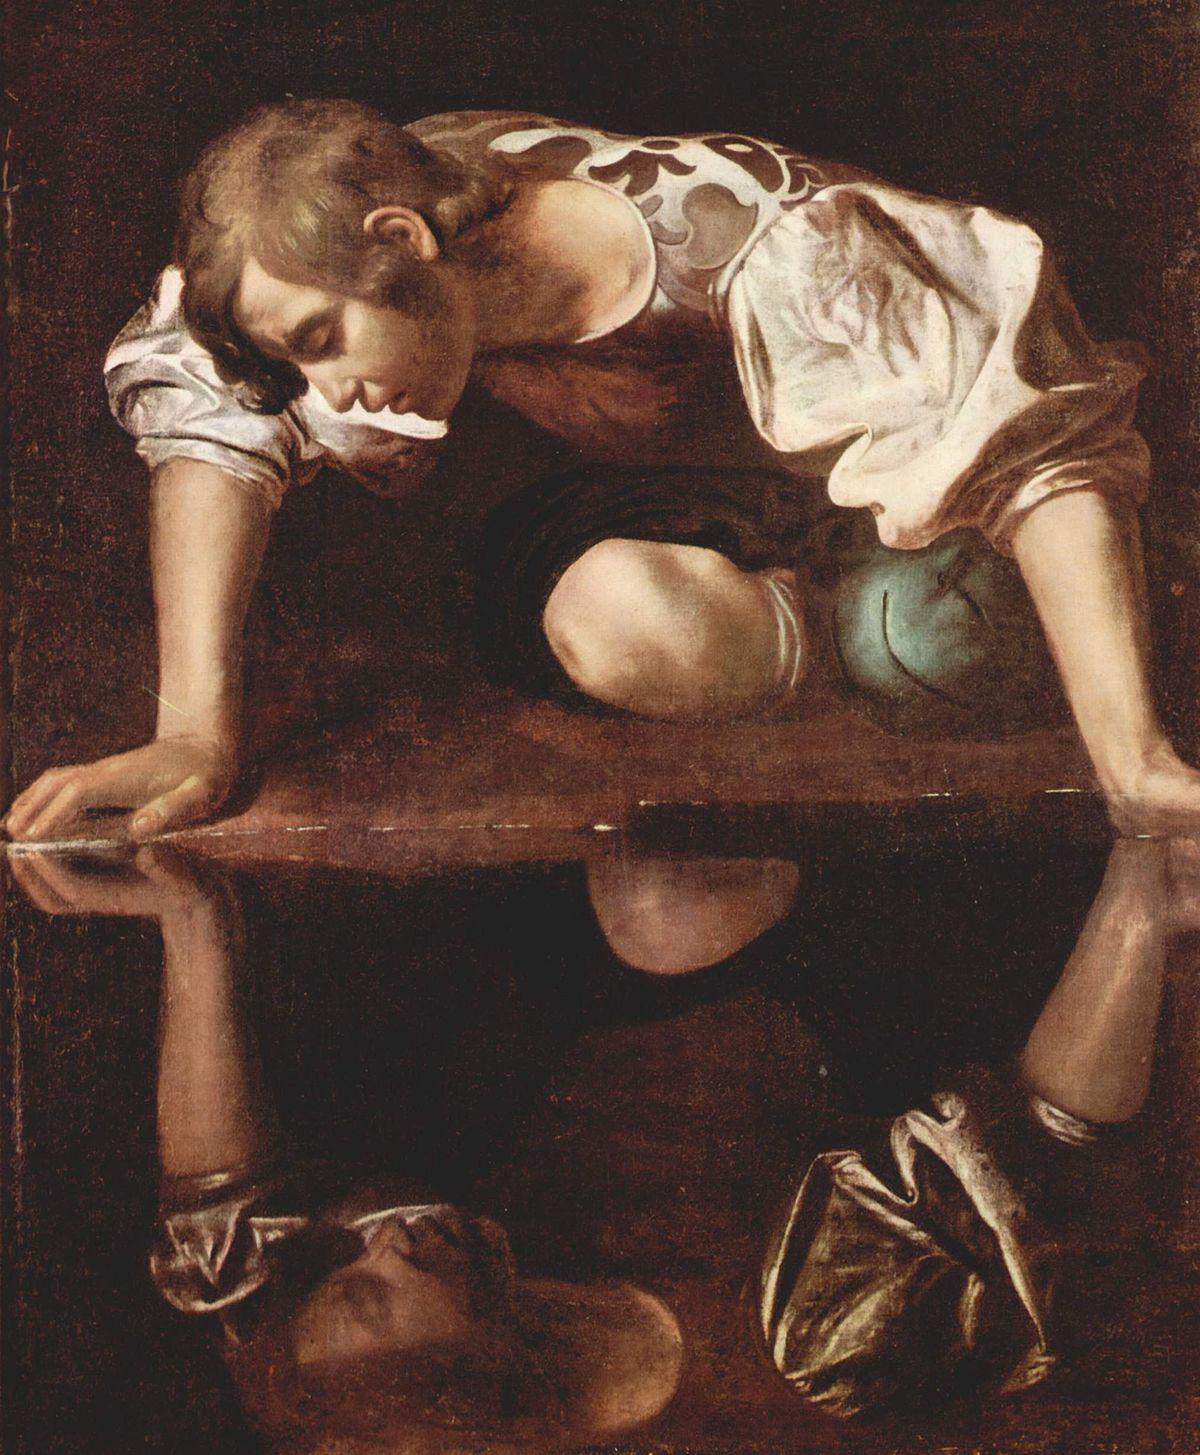 Le Mythe De Narcisse Aujourd'hui : mythe, narcisse, aujourd'hui, Narcisse, (mythologie), Wikipédia